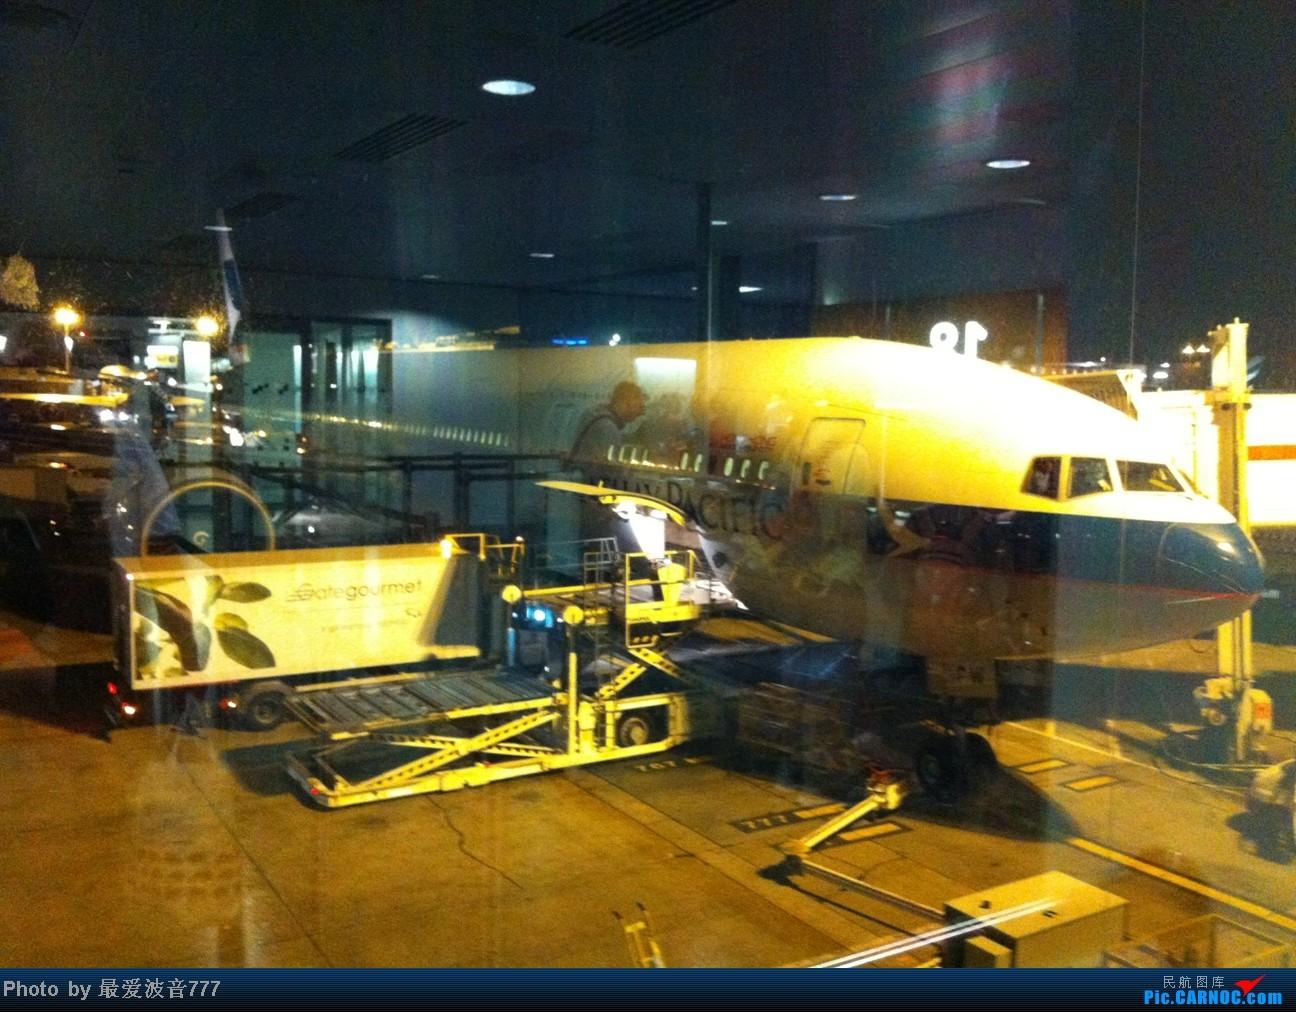 Re:[原创]假期的回国往返之旅 LHR-HKG-CTU-HKG-LHR, CX+CA+KA联合运营 BOEING 777-300  英国伦敦希思罗机场